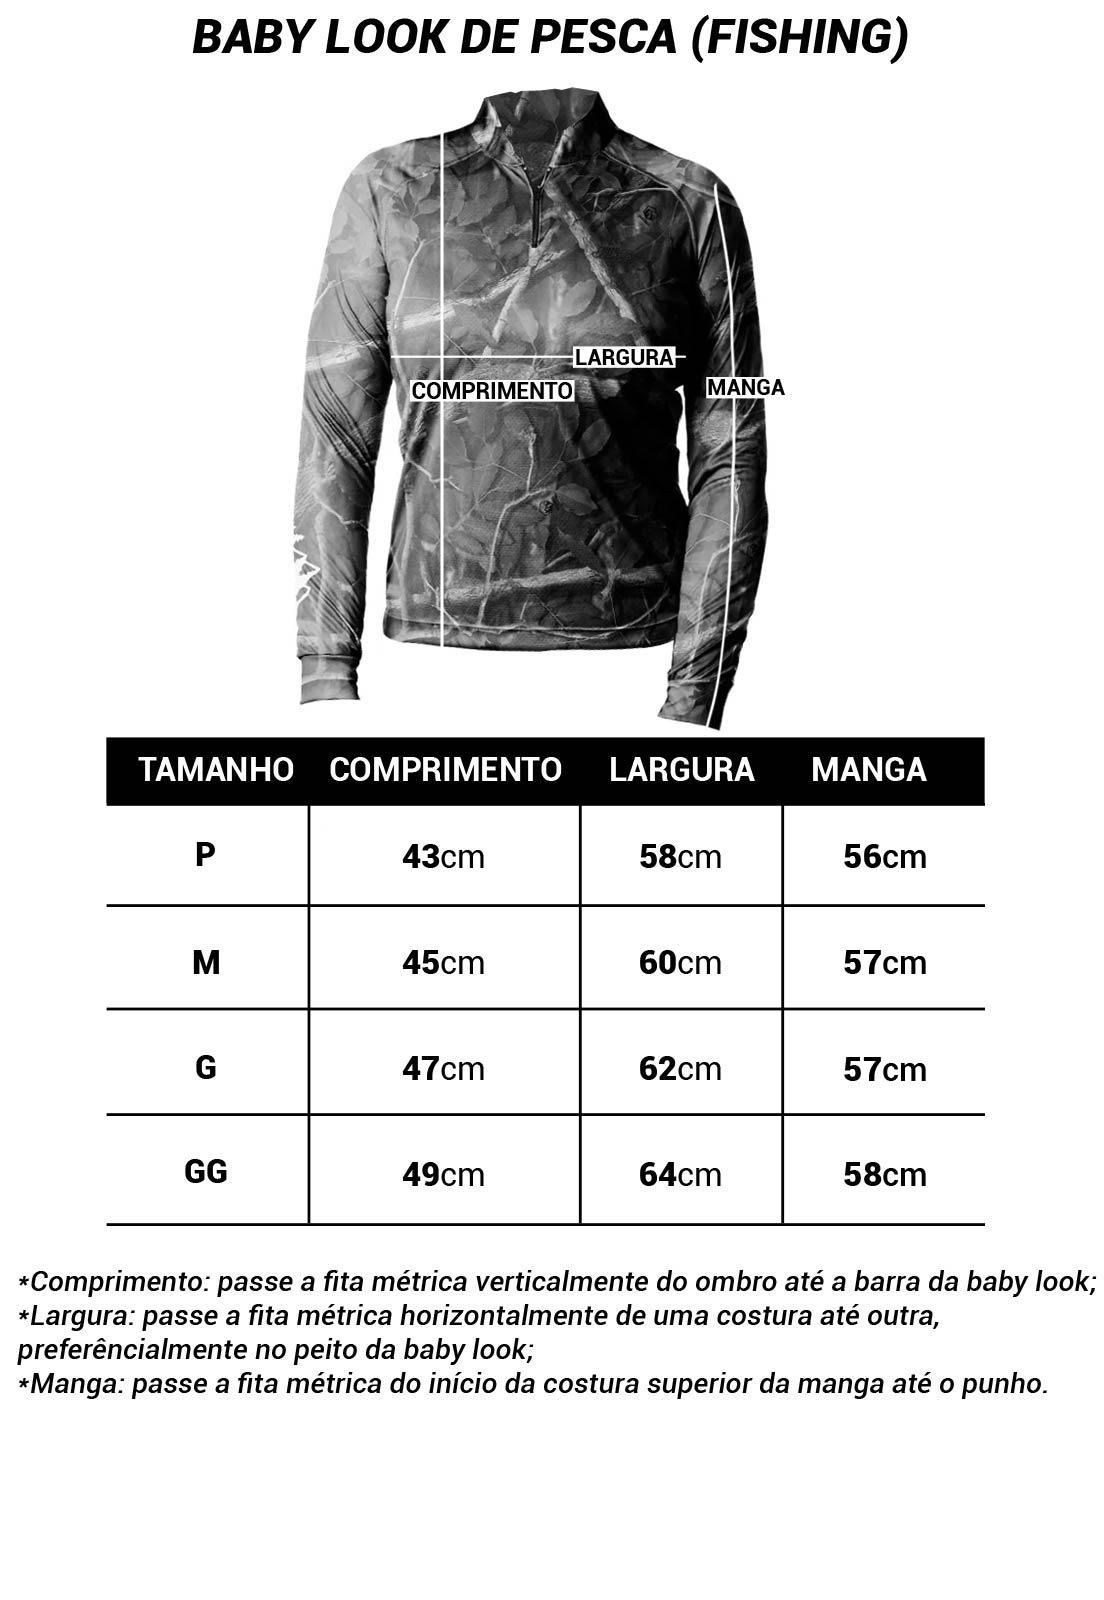 CAMISA DE PESCA FISH CAMUFLADA PRO 13 FEMININA + BANDANA GRÁTIS  - REAL HUNTER OUTDOORS